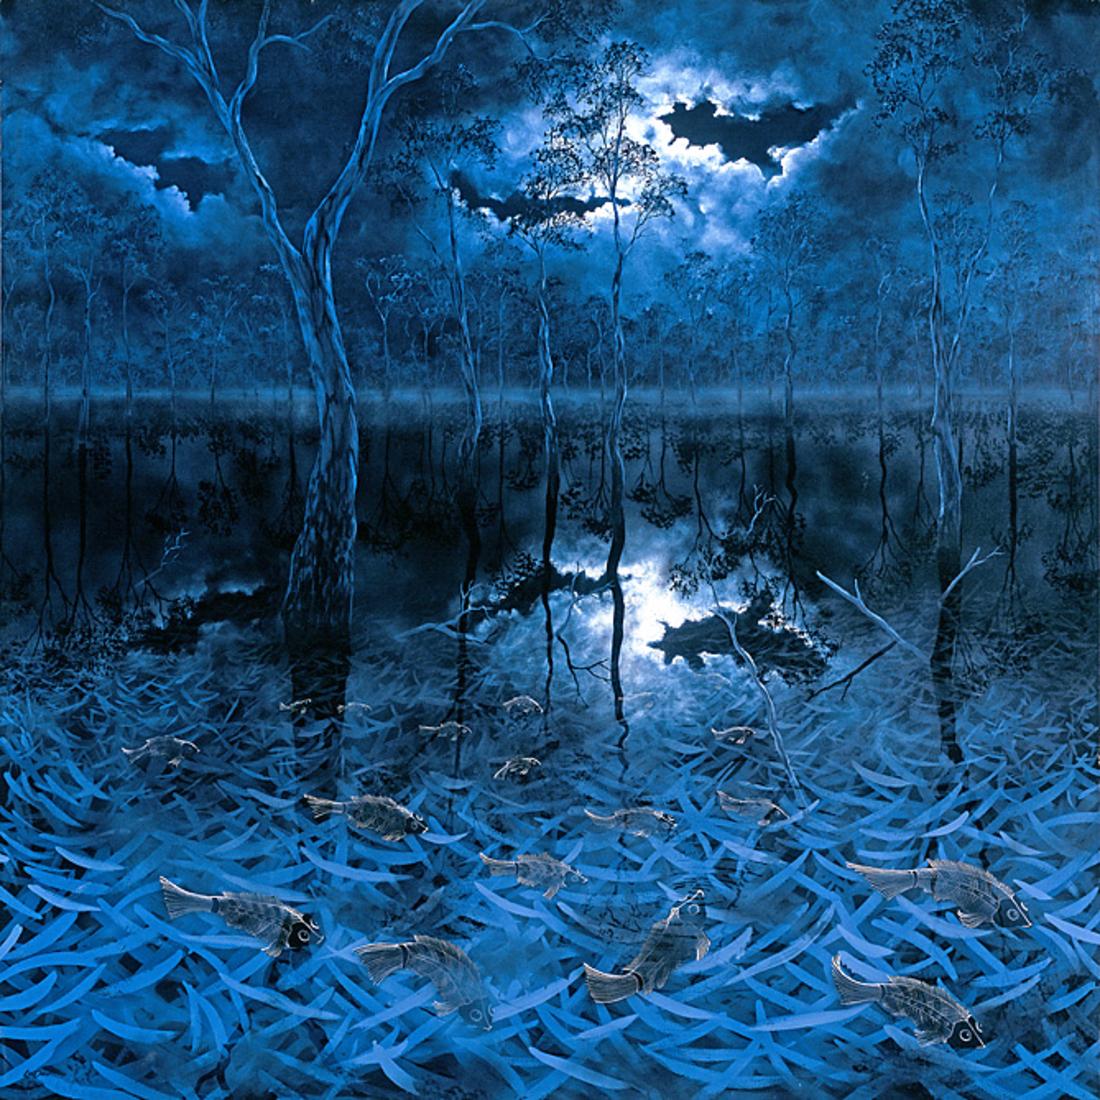 William McLintock (Lin) ONUS (b.1948; d.1996) - MORUMBEEJA PITOA (MOONLIGHT & FLOODS)